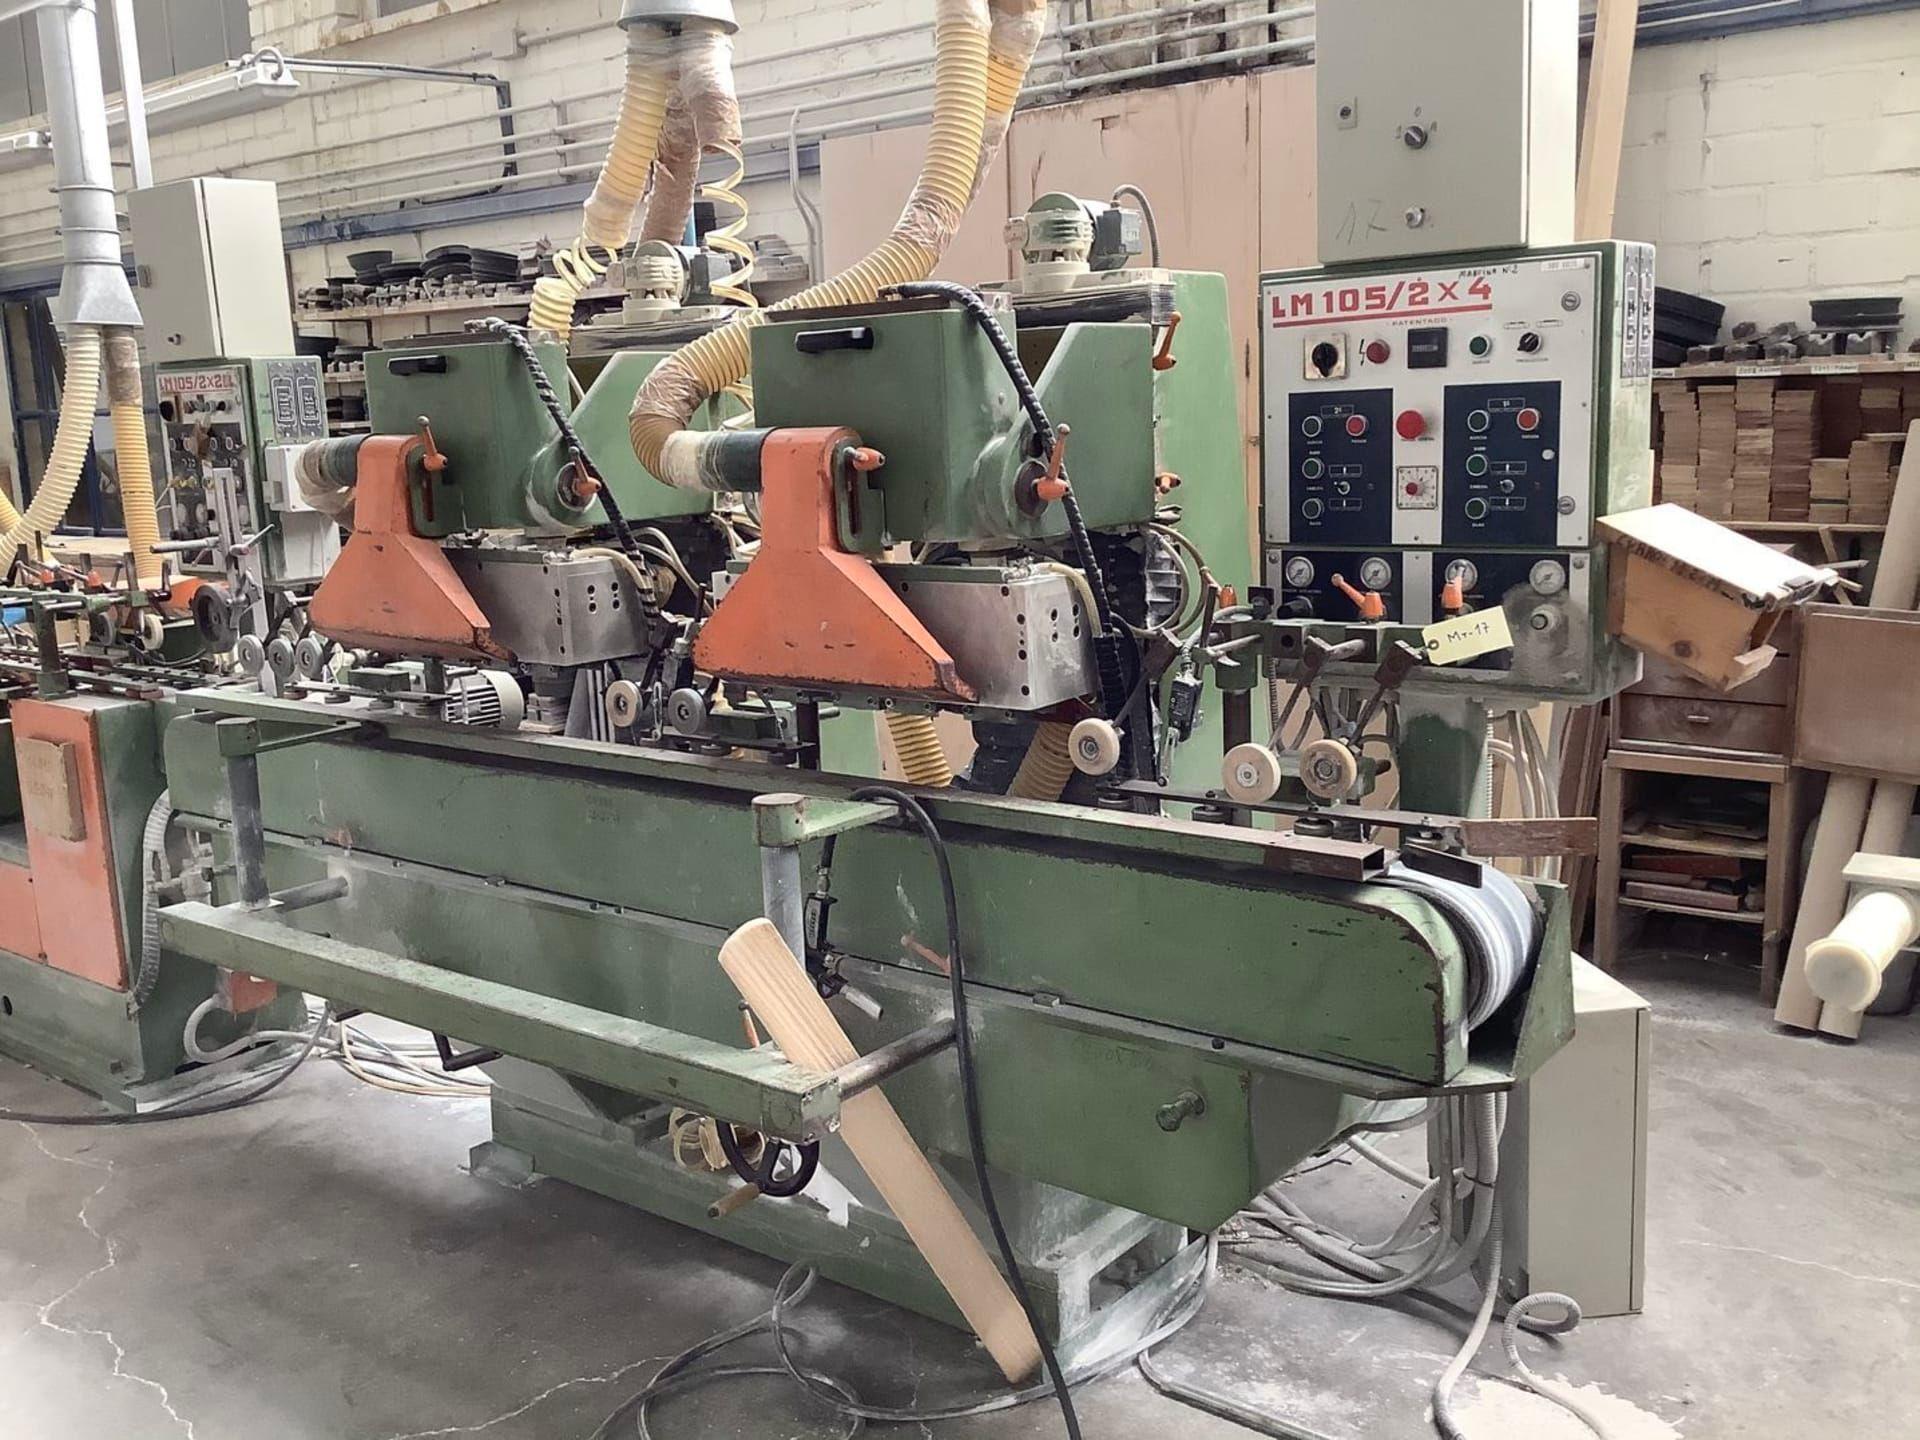 BALENCIAGA LM 105 2x4 Profilschleifmaschine